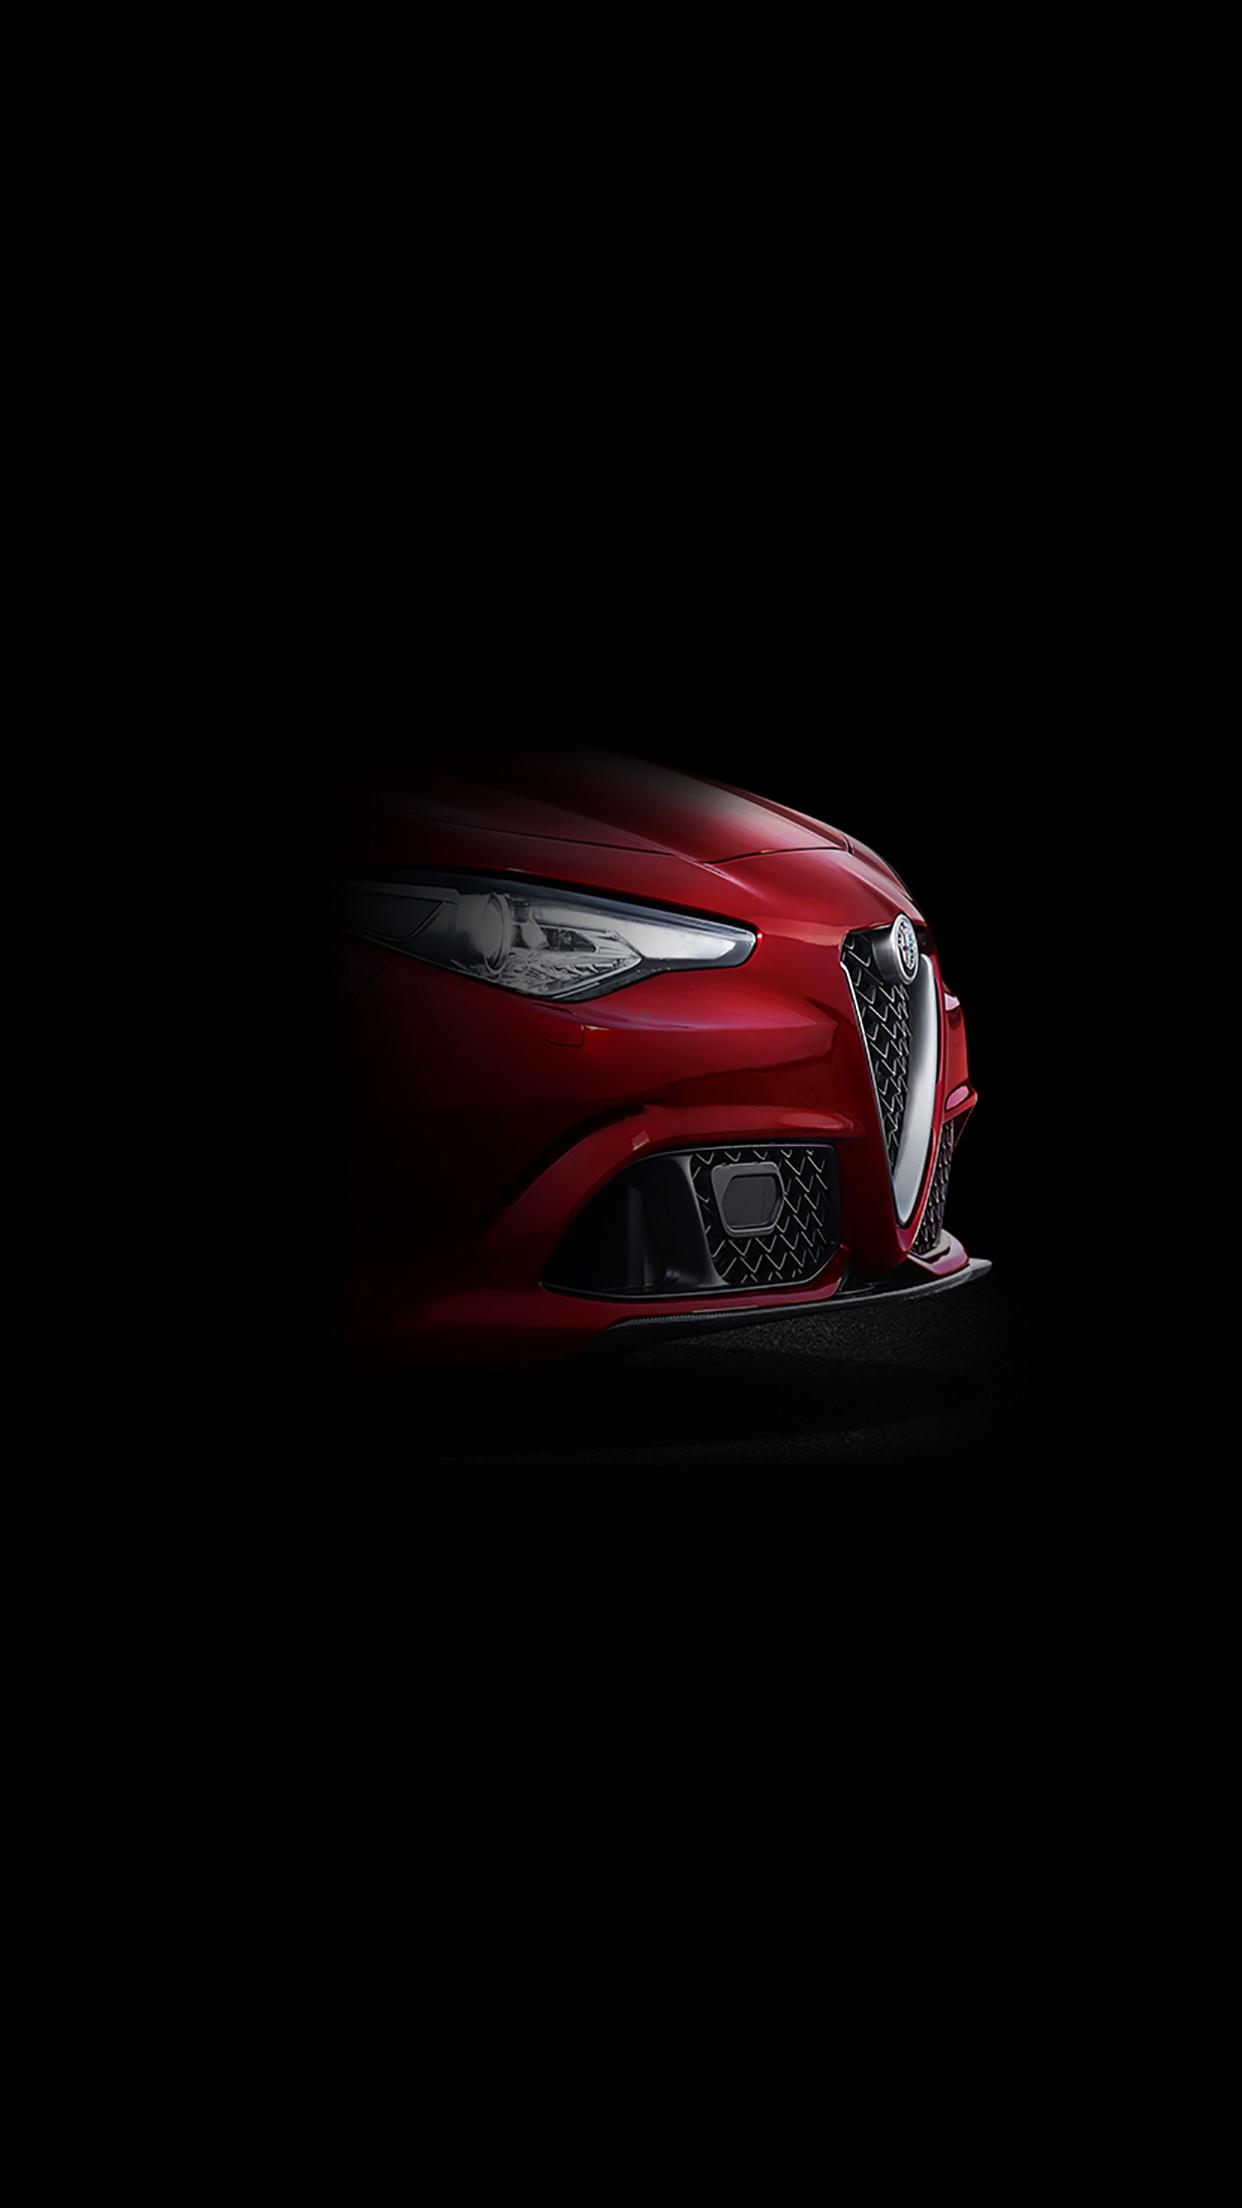 Hd wallpaper whatsapp download - Wallpaper Hd Iphone Alfa Romeo Giulia Tecnologia Free